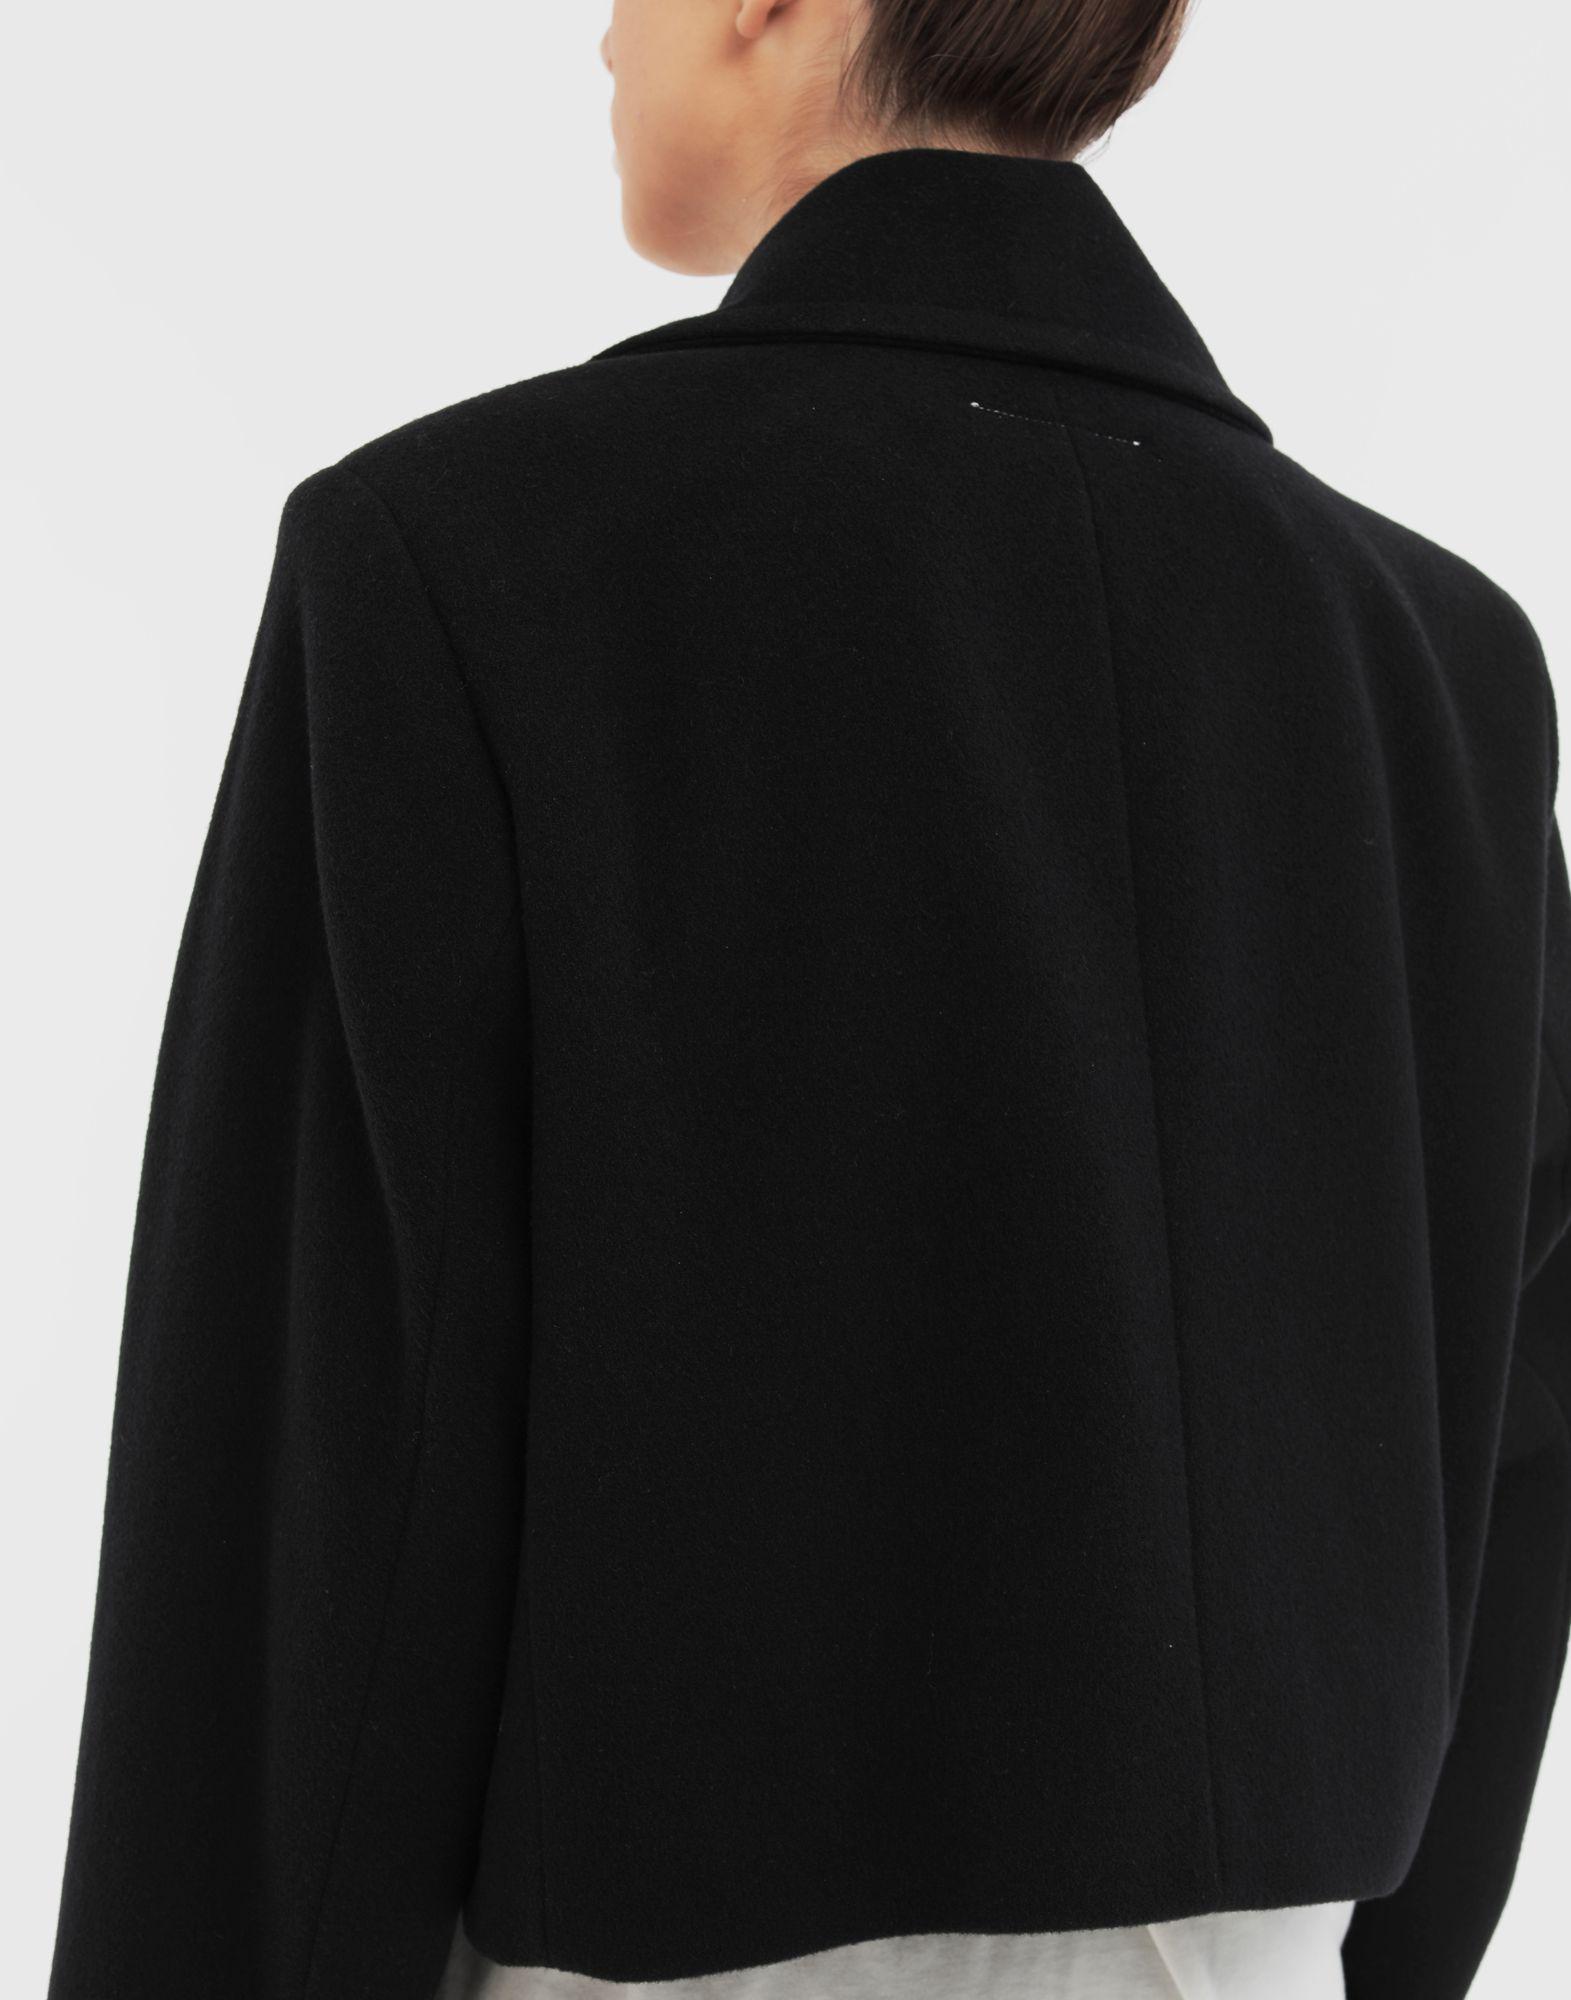 MM6 MAISON MARGIELA Jacket with strings Jacket Woman b